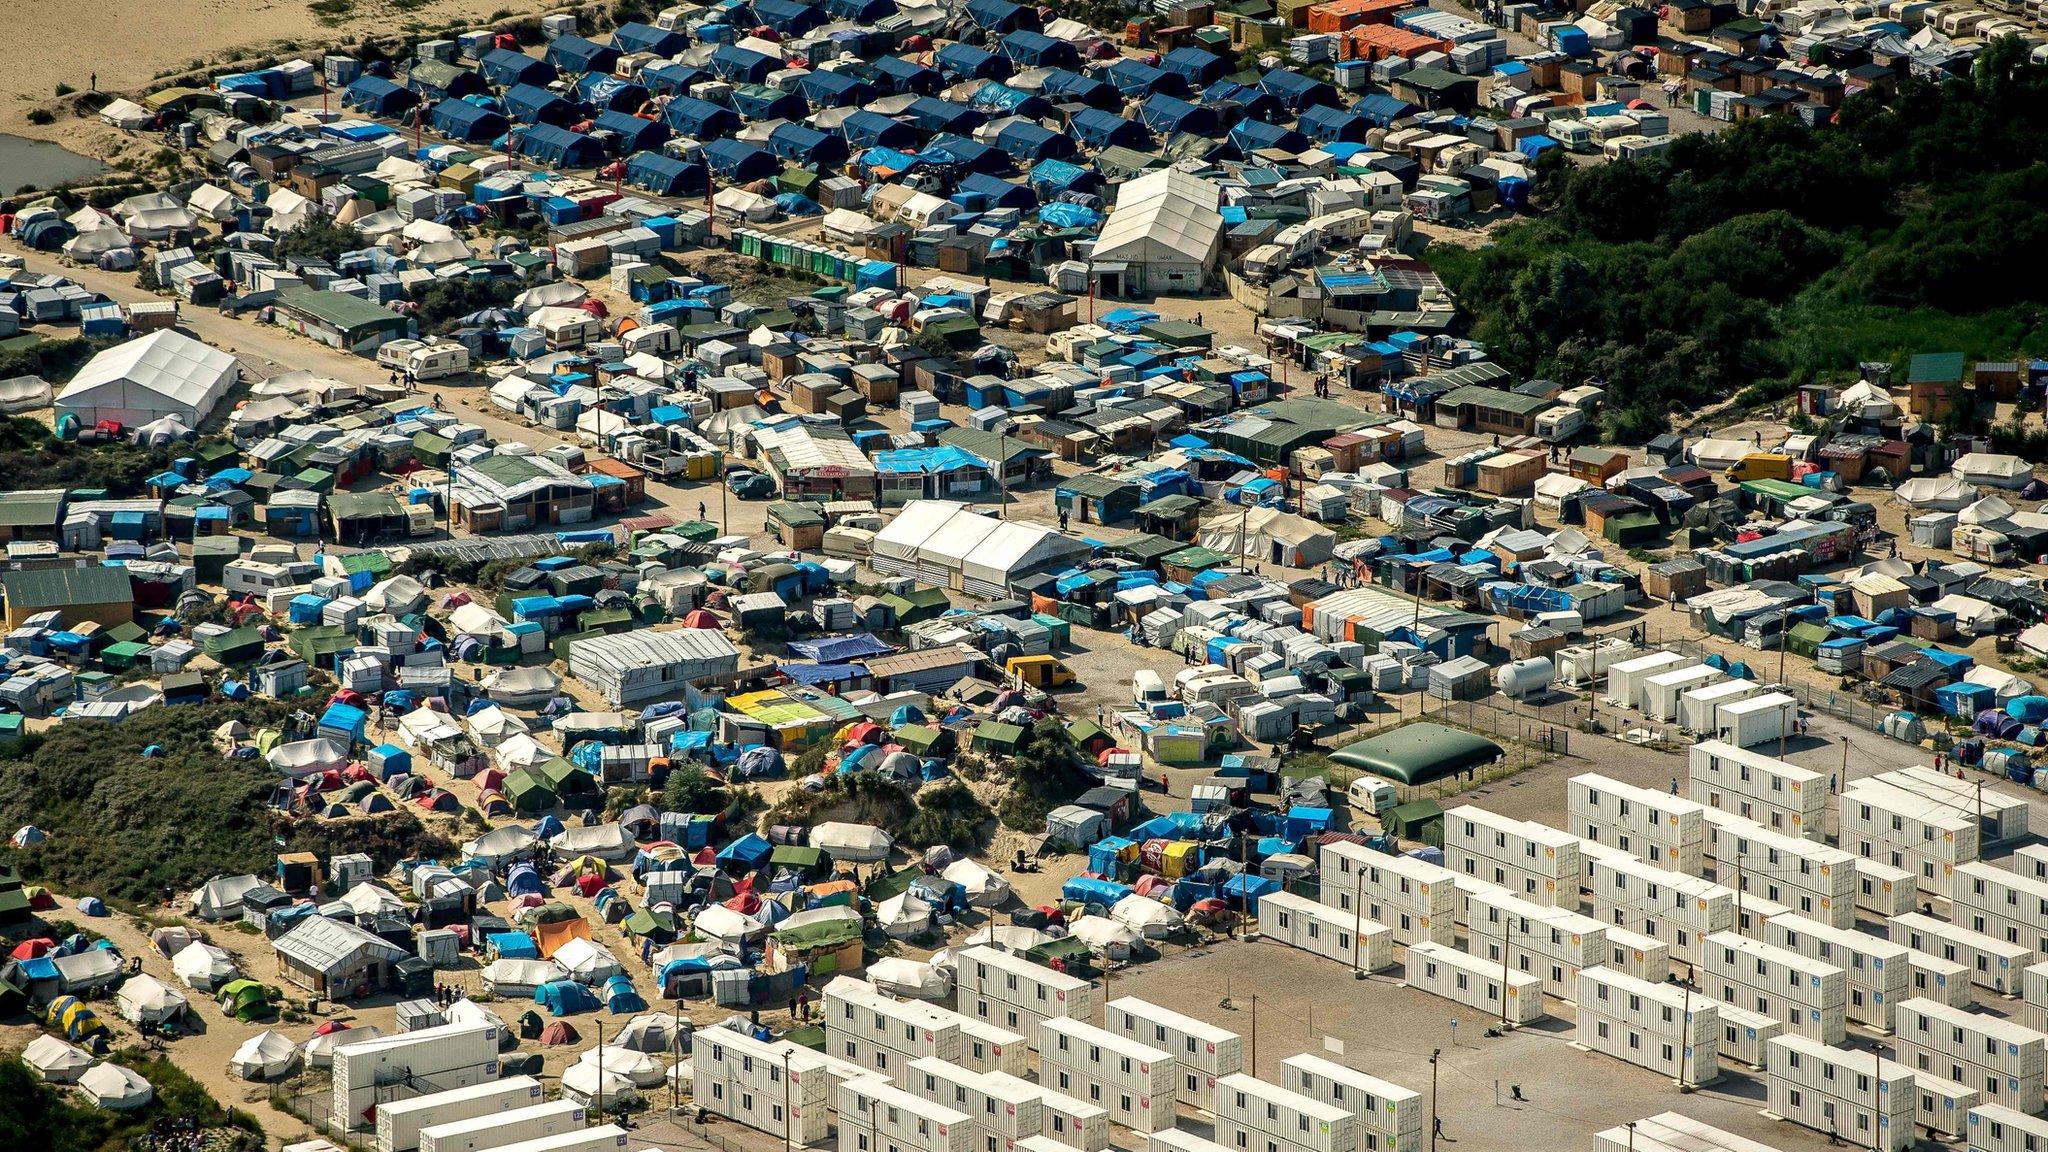 Calais migrants: Hollande sets out plan to close Jungle camp